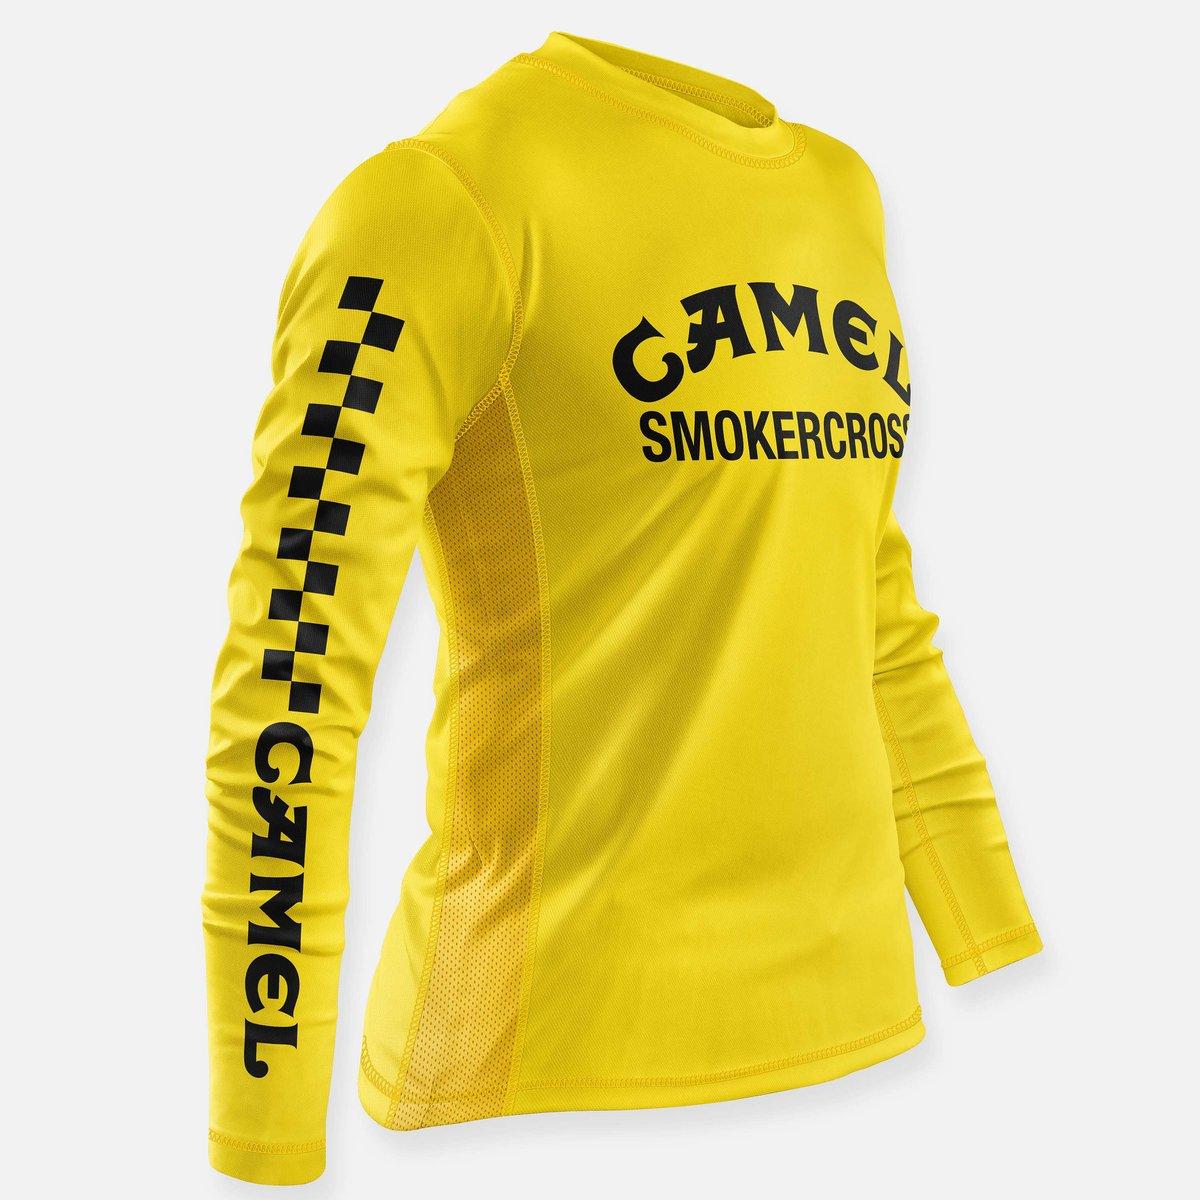 Image of CAMEL SMOKERCROSS JERSEY YELLOW